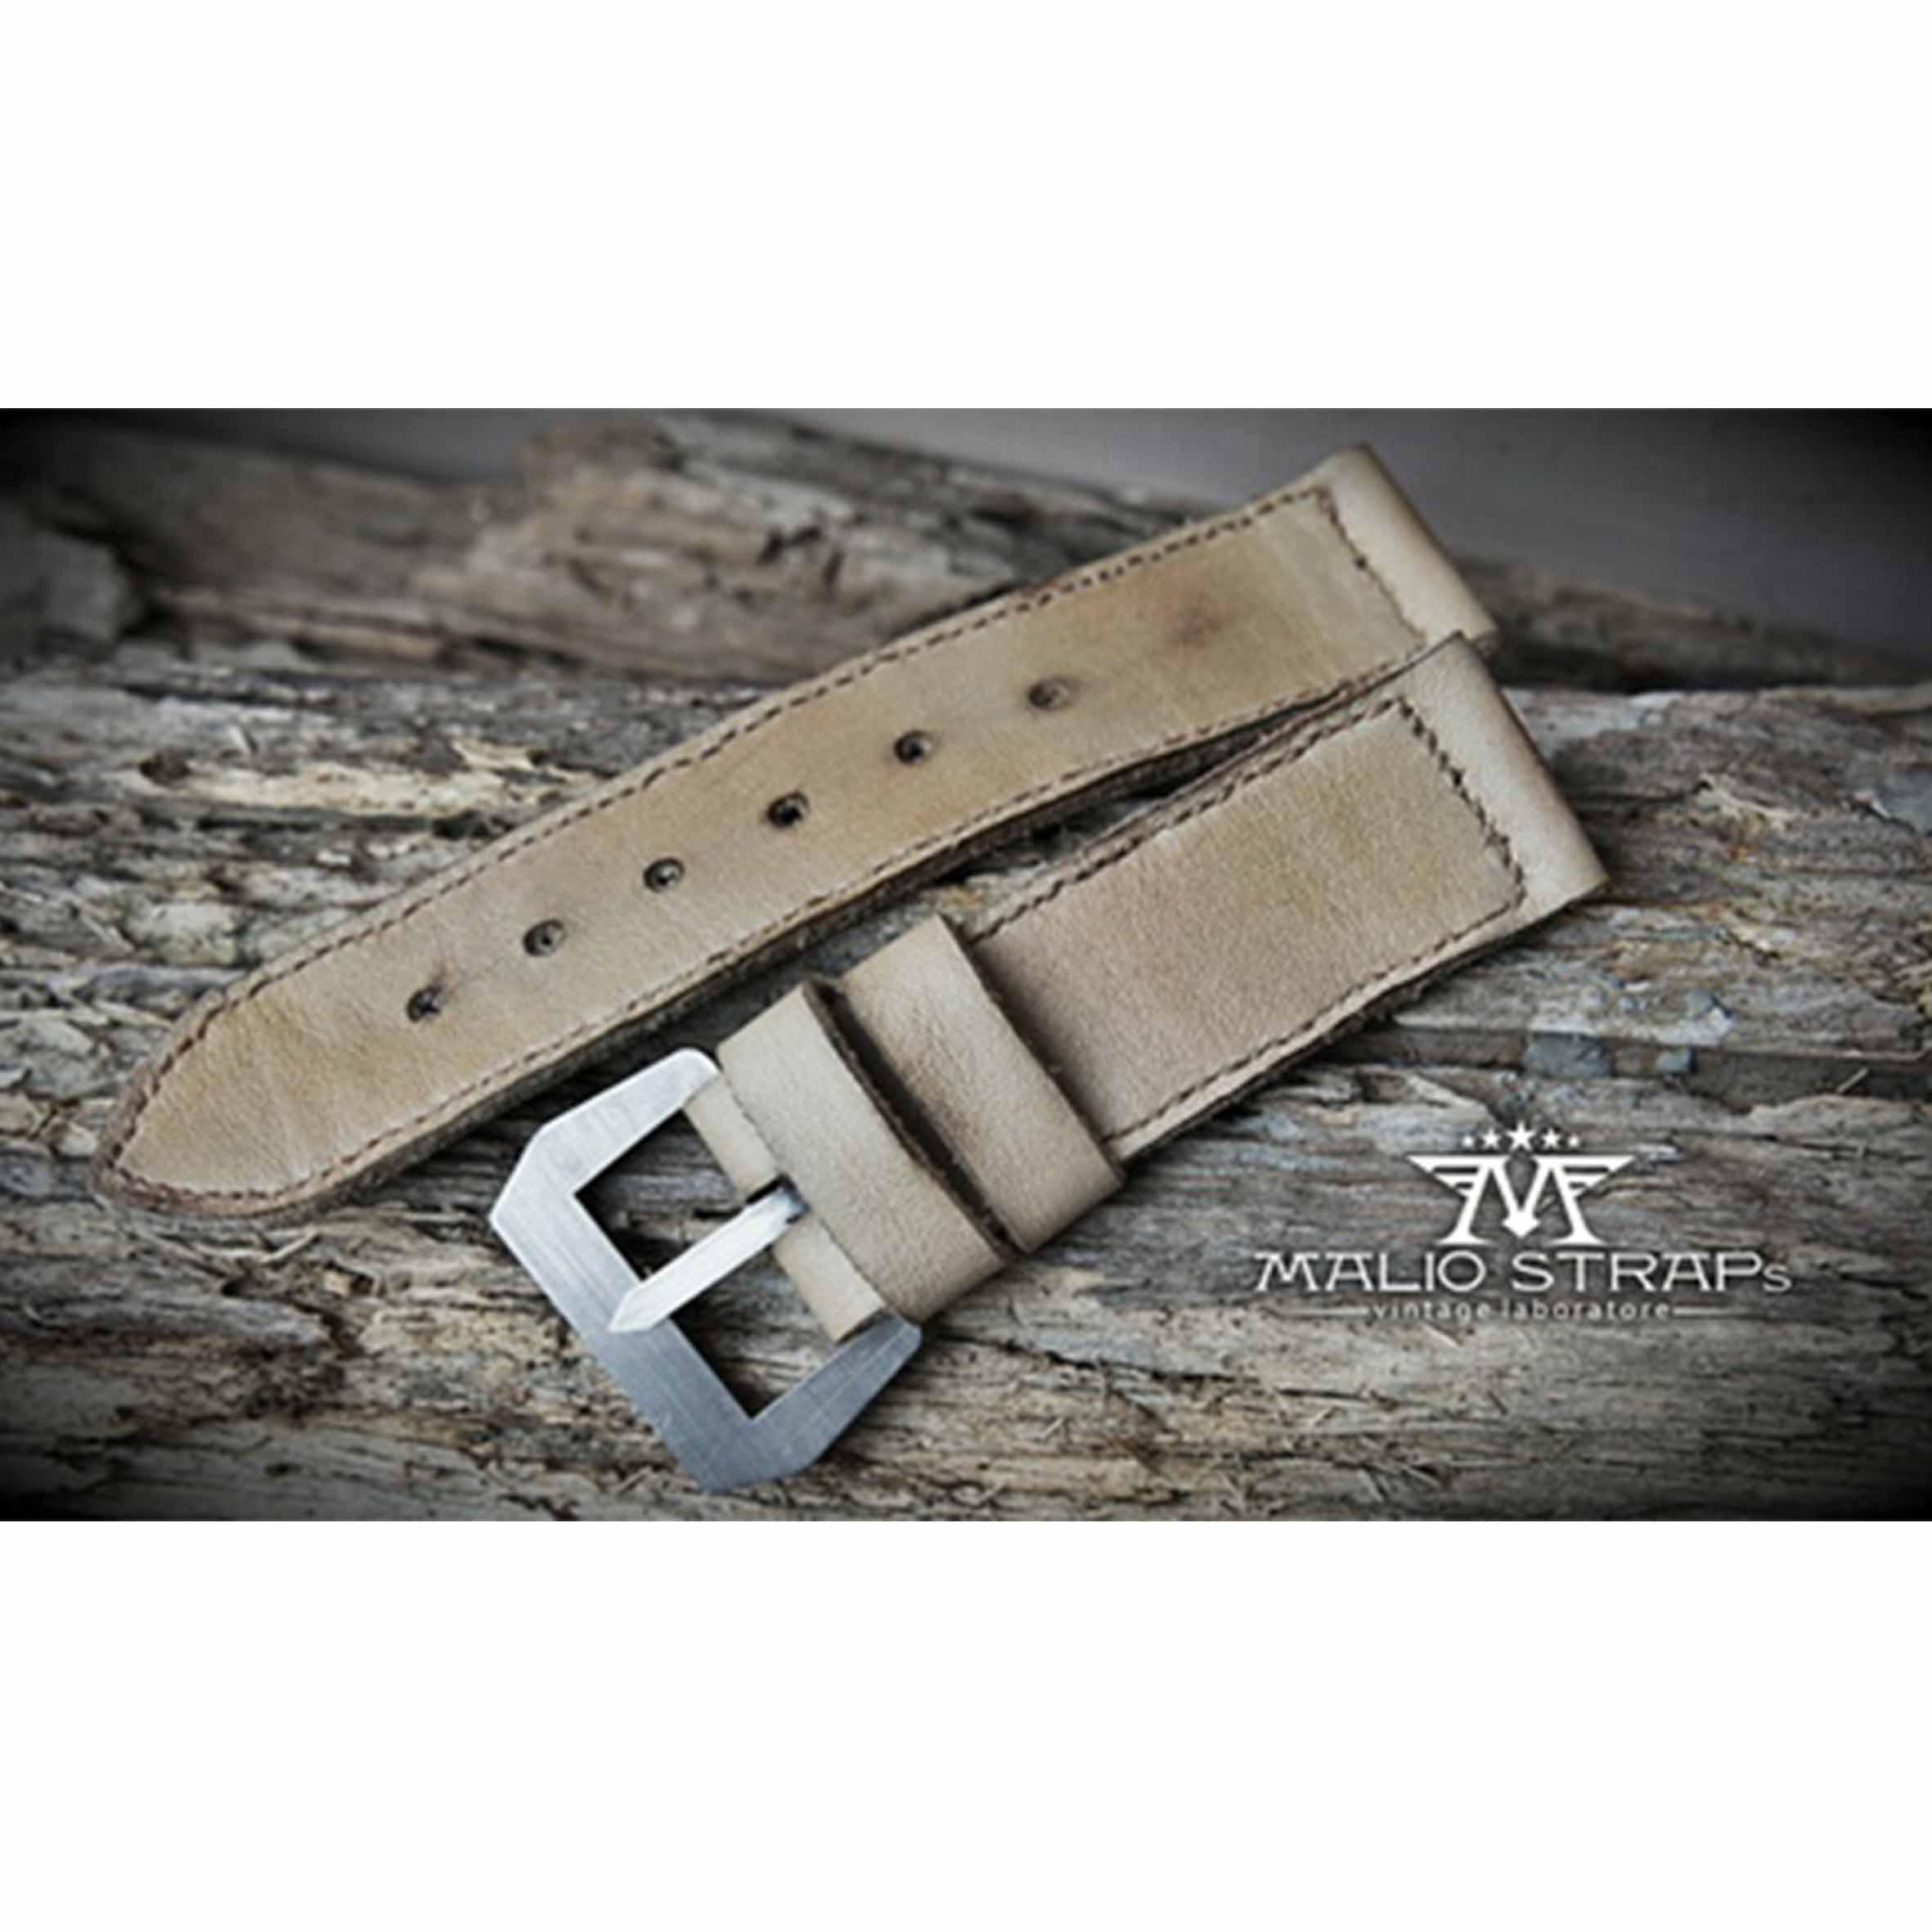 malio-straps-d'avorio-strapsonly (1)